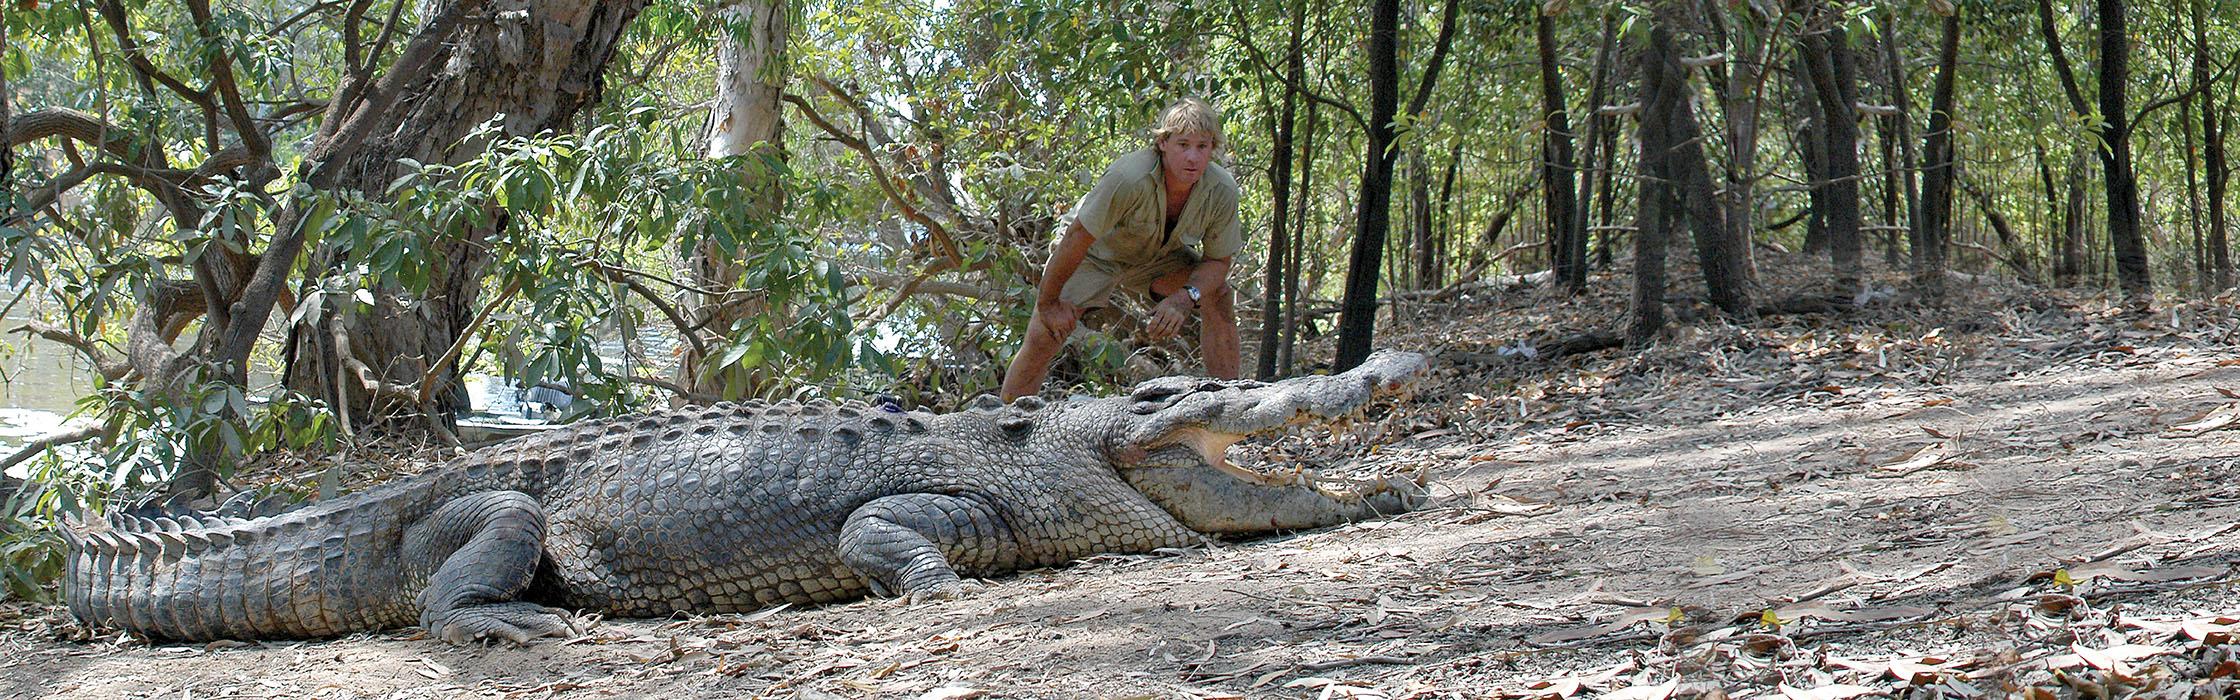 SupportWildlife-CrocodileConservation_Petition2240x700